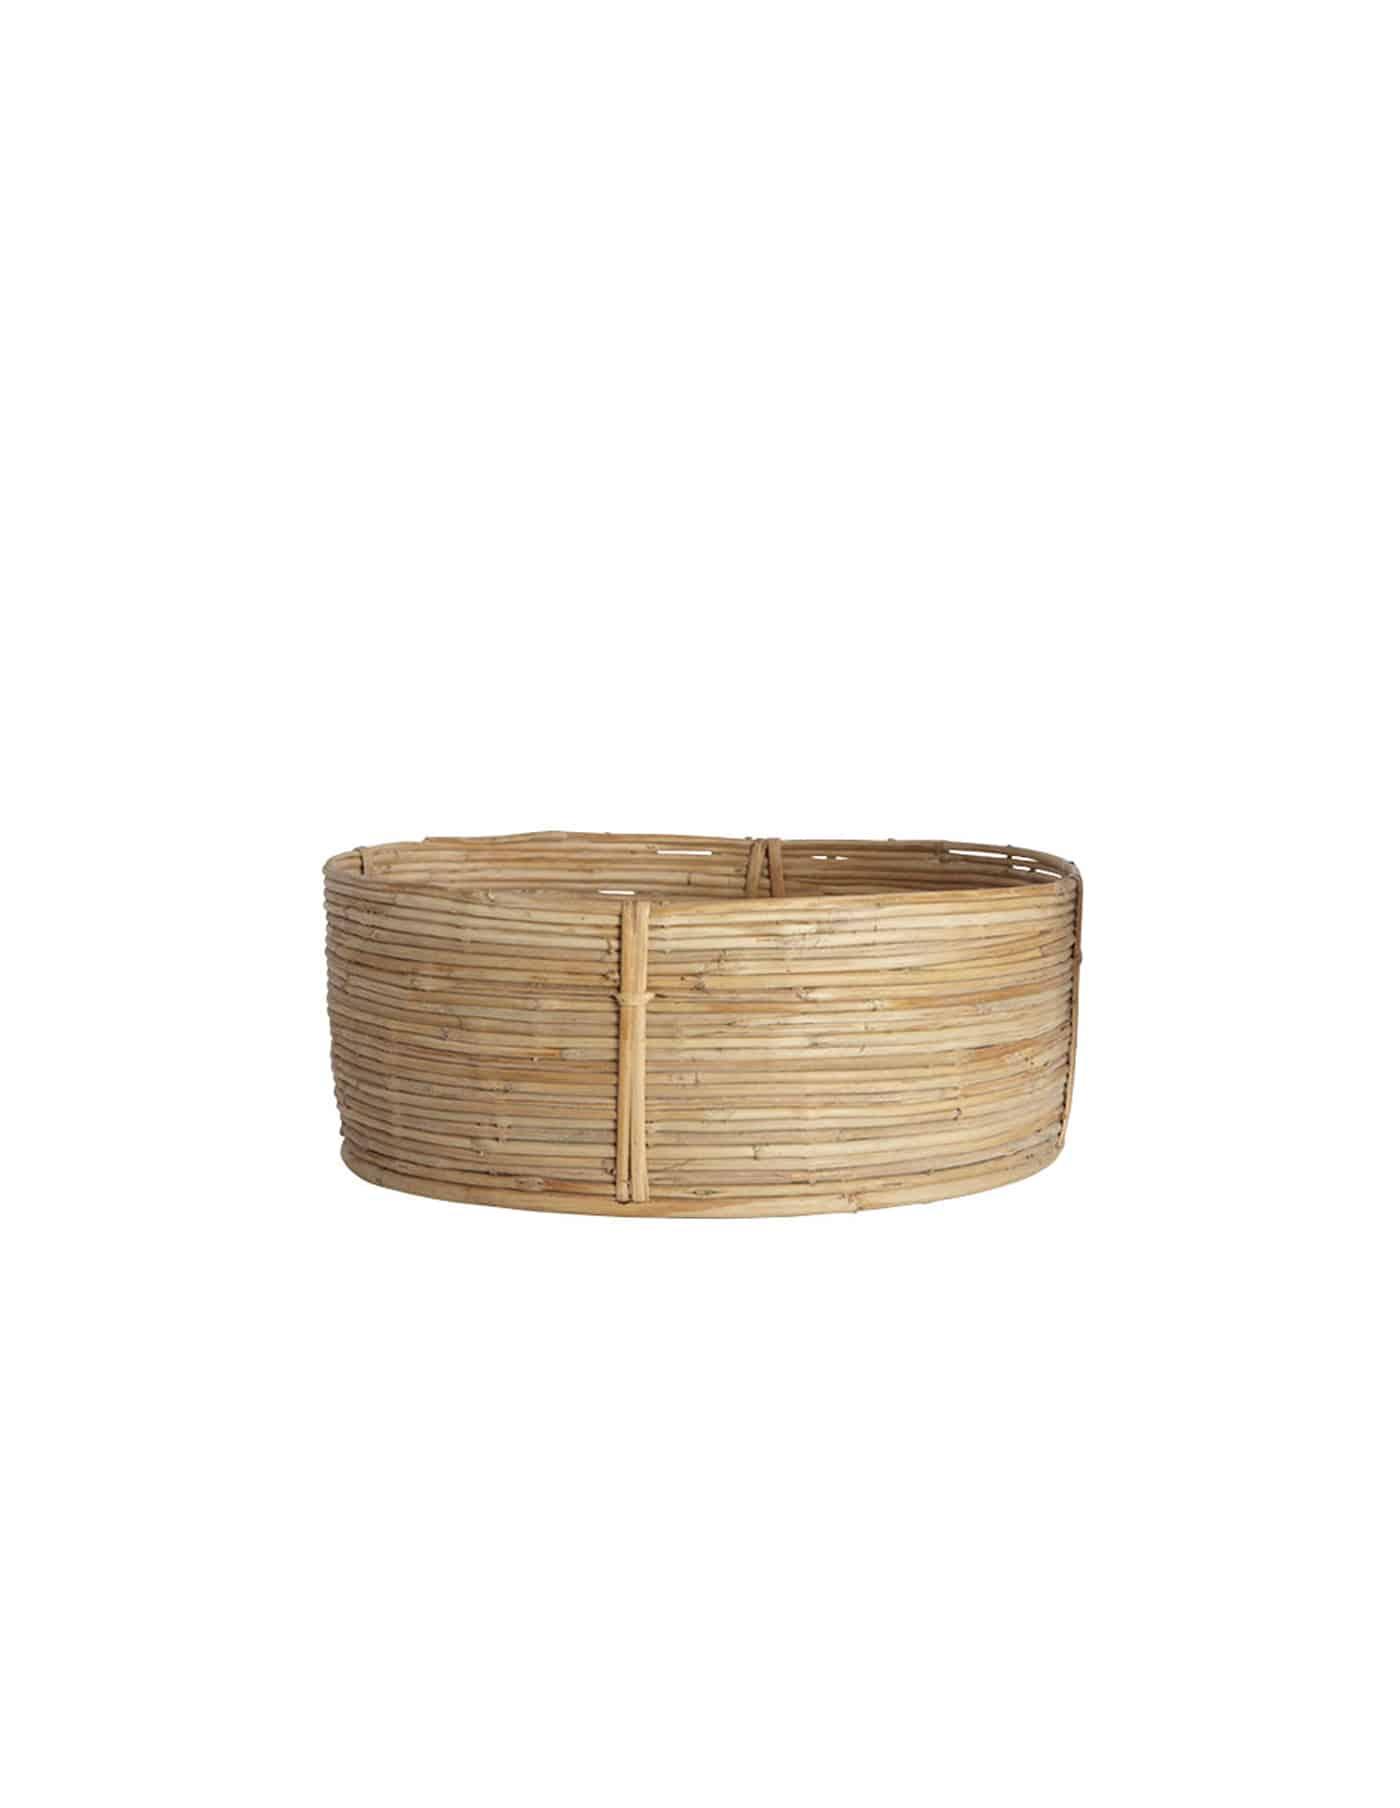 Large Retro Rattan Basket, House Doctor